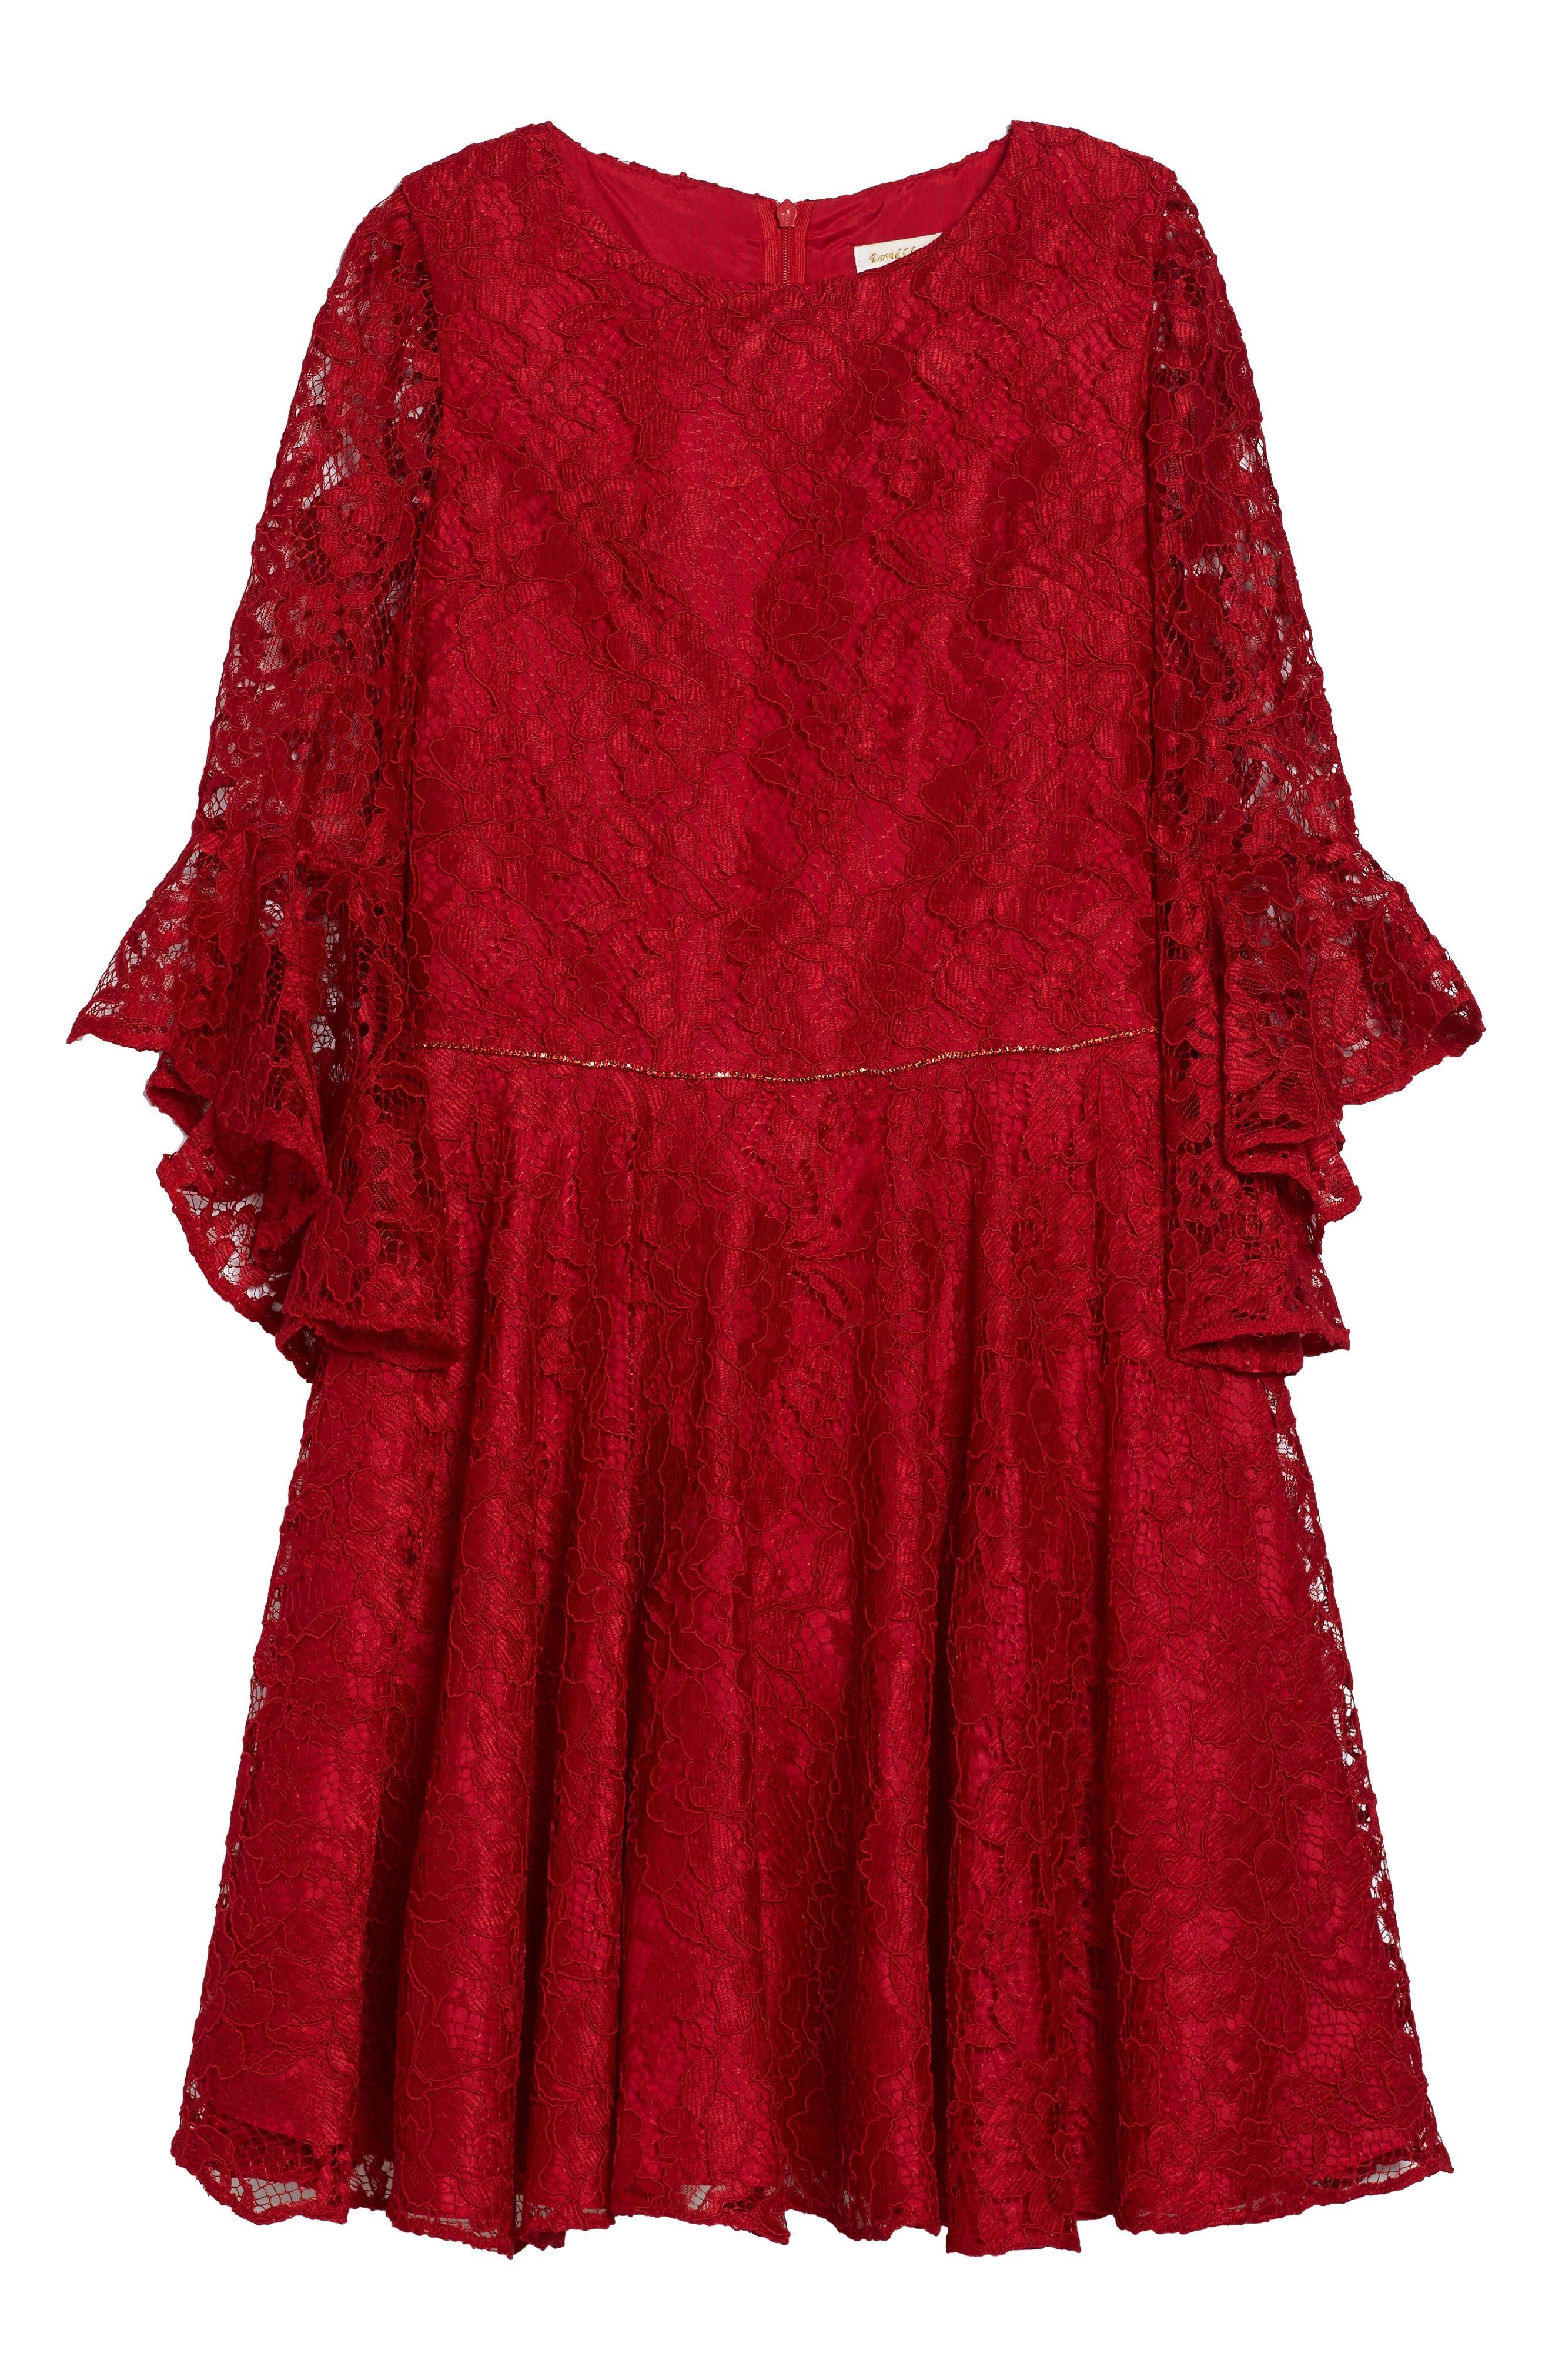 Main Image - David Charles Bell Sleeve Lace Dress (Big Girls)